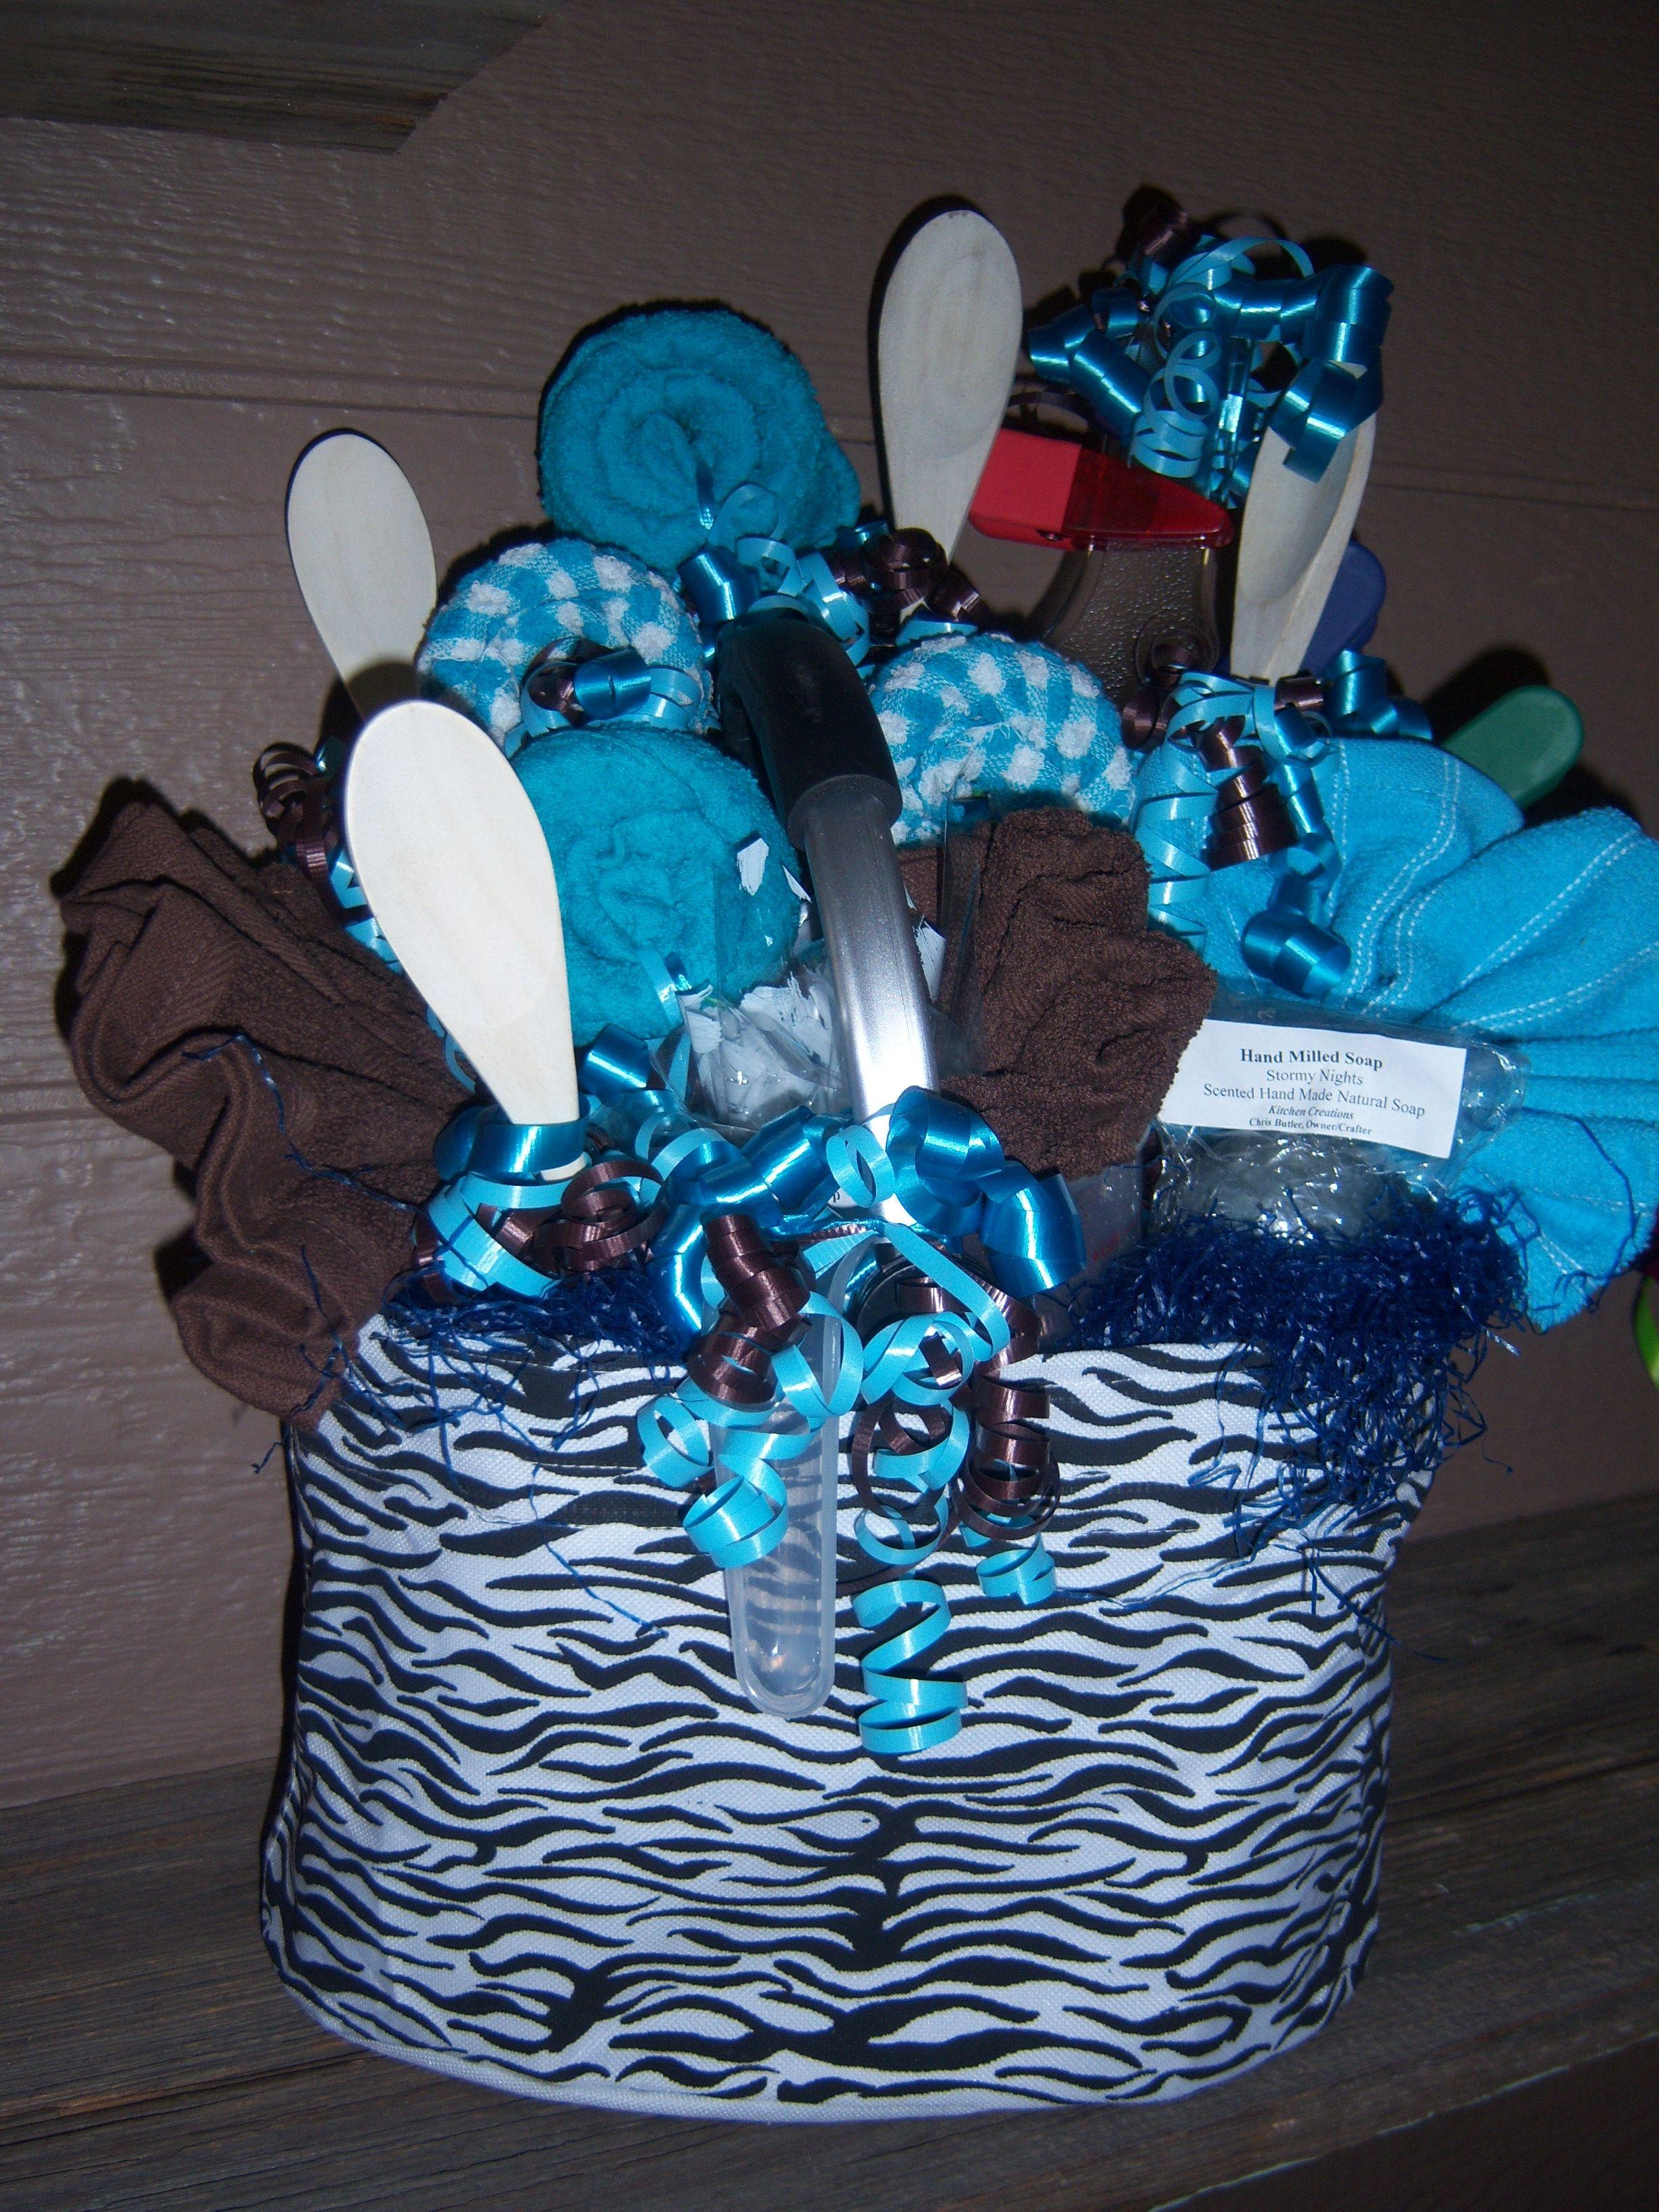 Kitchen gift basket! 4 dish rags, 4 dish cloths, small cutting board ...